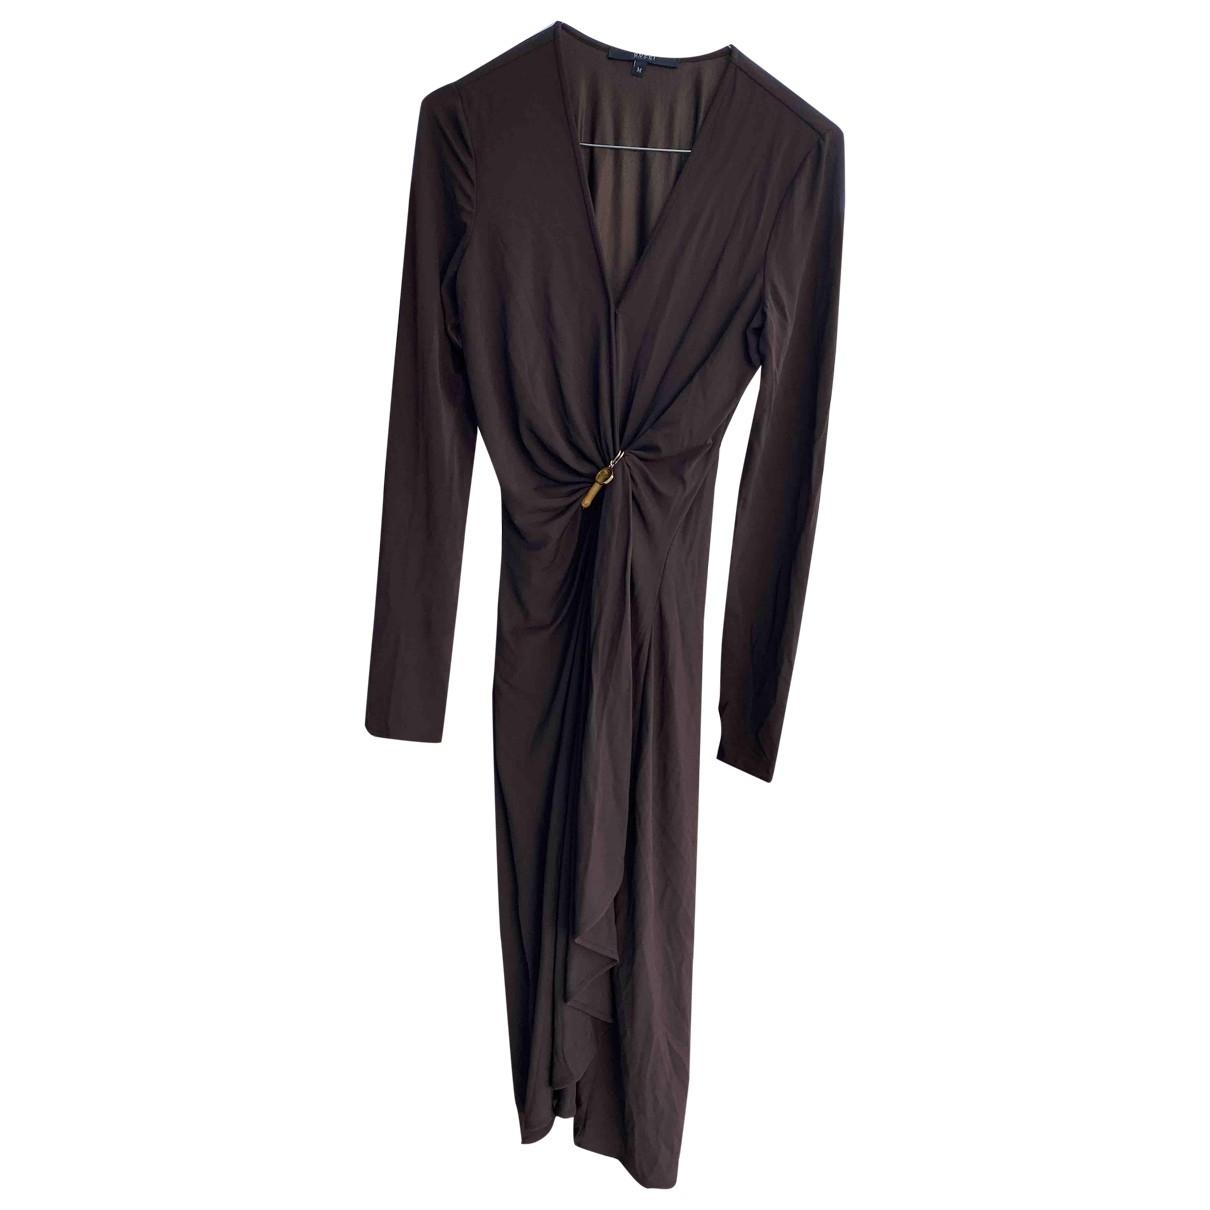 Gucci \N Kleid in  Braun Polyester